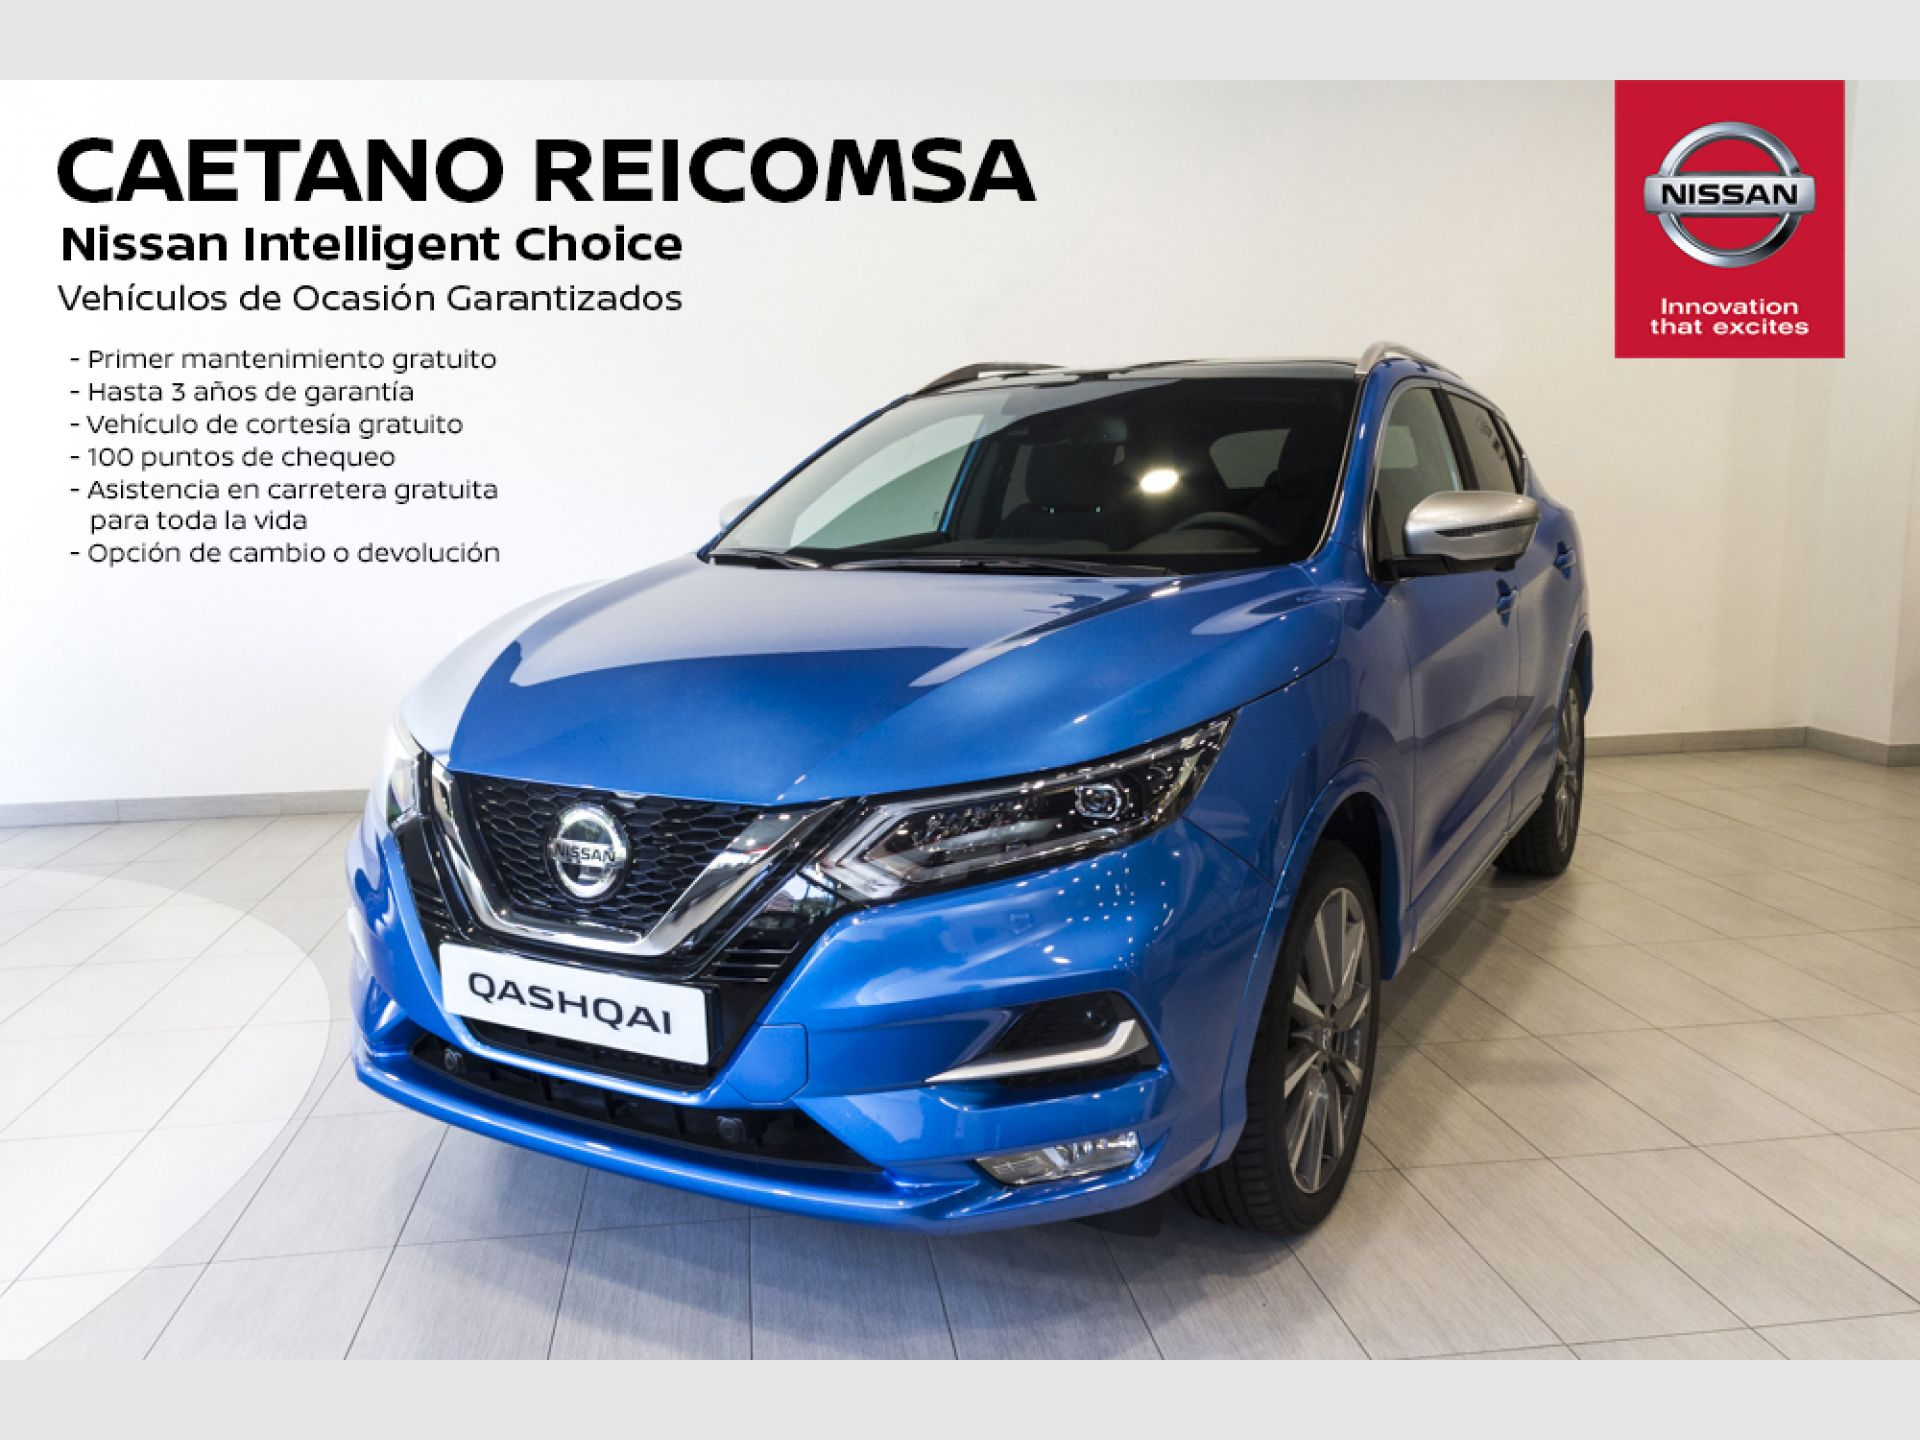 Nissan Qashqai DIG-T 103 kW (140 CV) E6D N-MOTION segunda mano Madrid